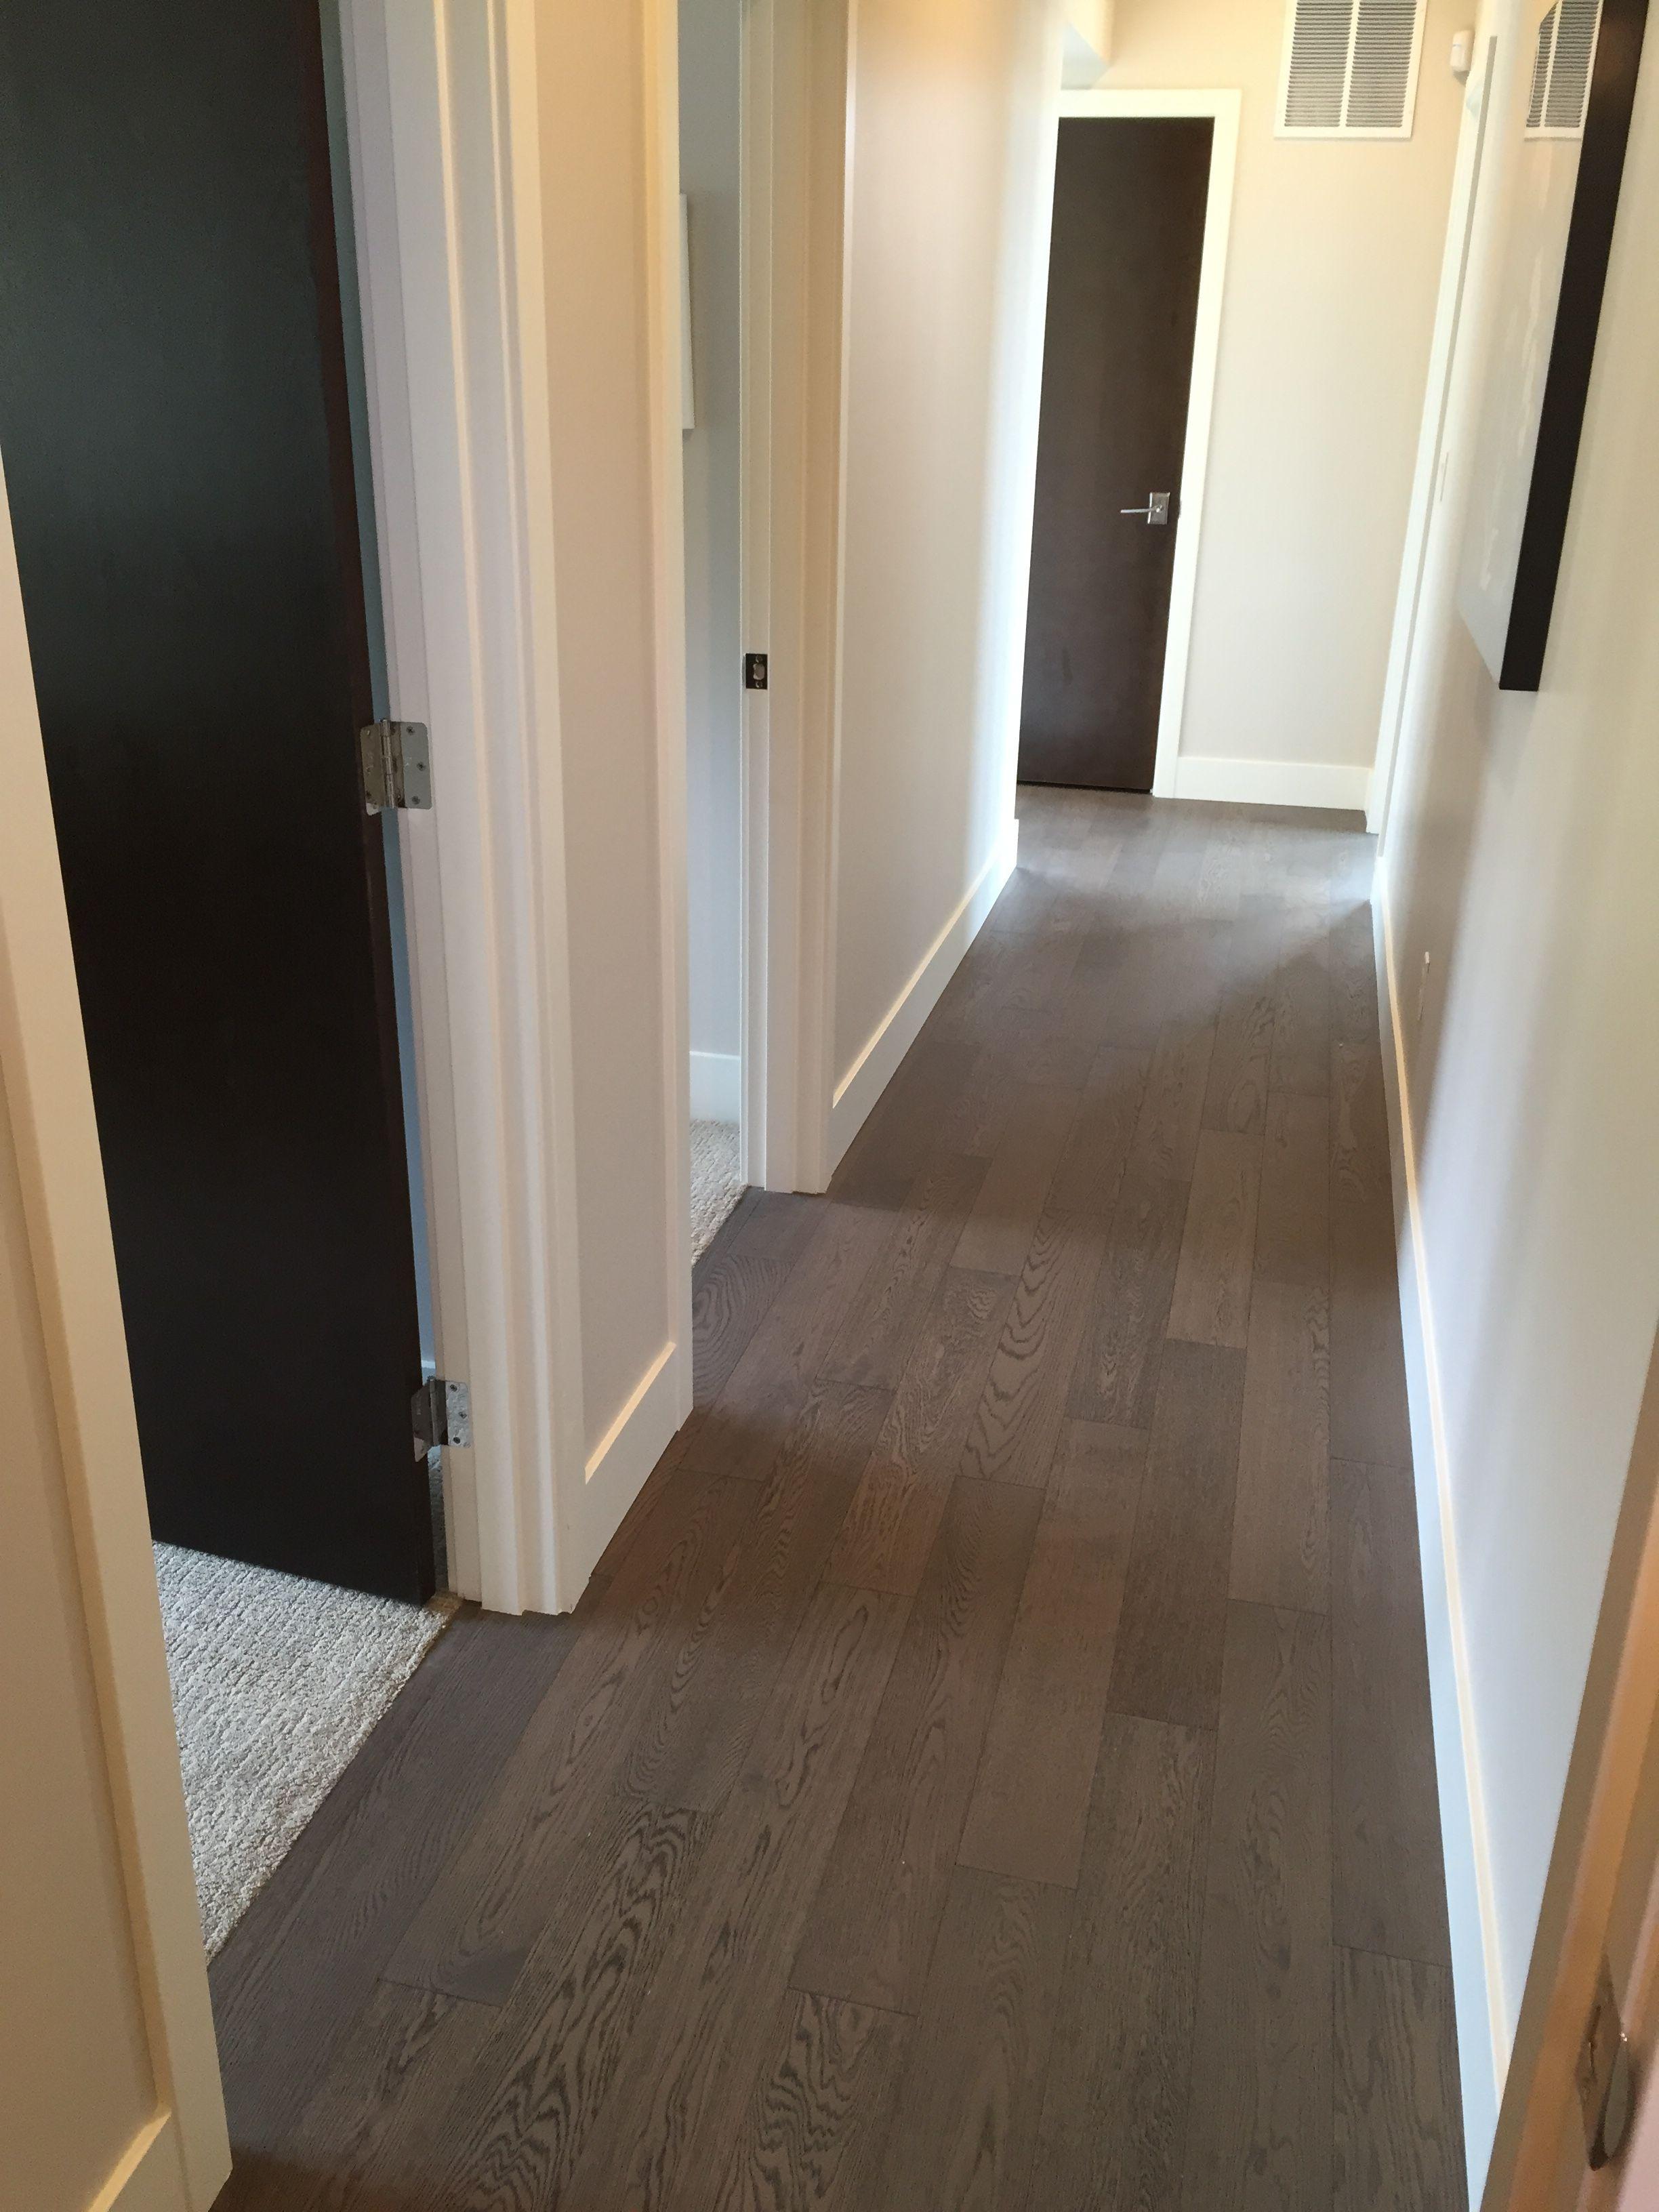 Upper Hall Flooring Similar To Basement Hall Wood Flooring In